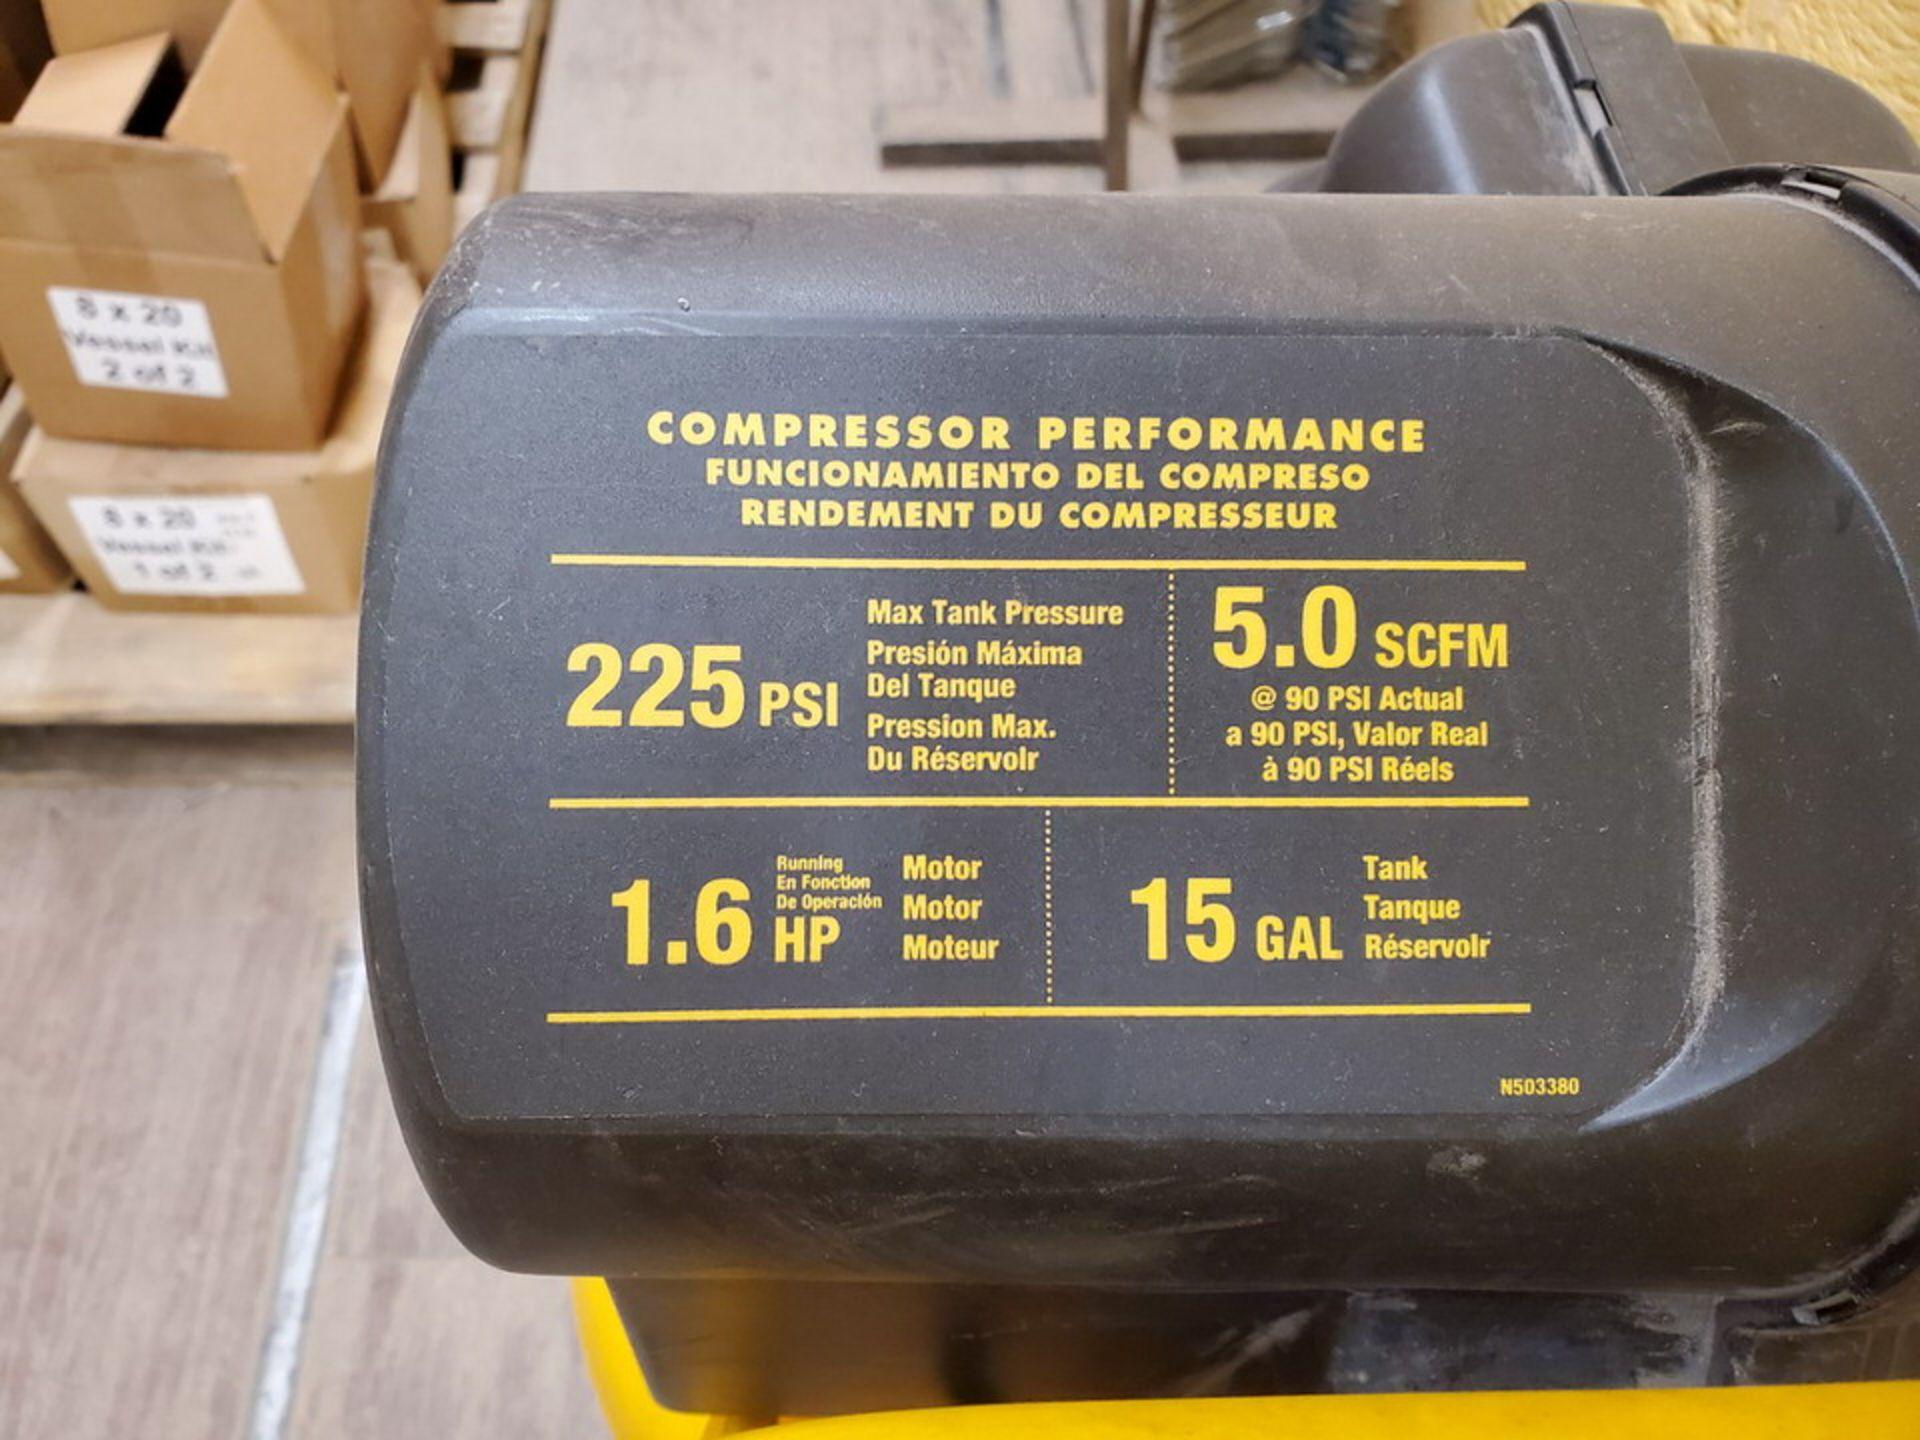 Dewalt Air Compressor 225psi, 1.6HP, 15Gal, 5.0 SCFM - Image 6 of 6